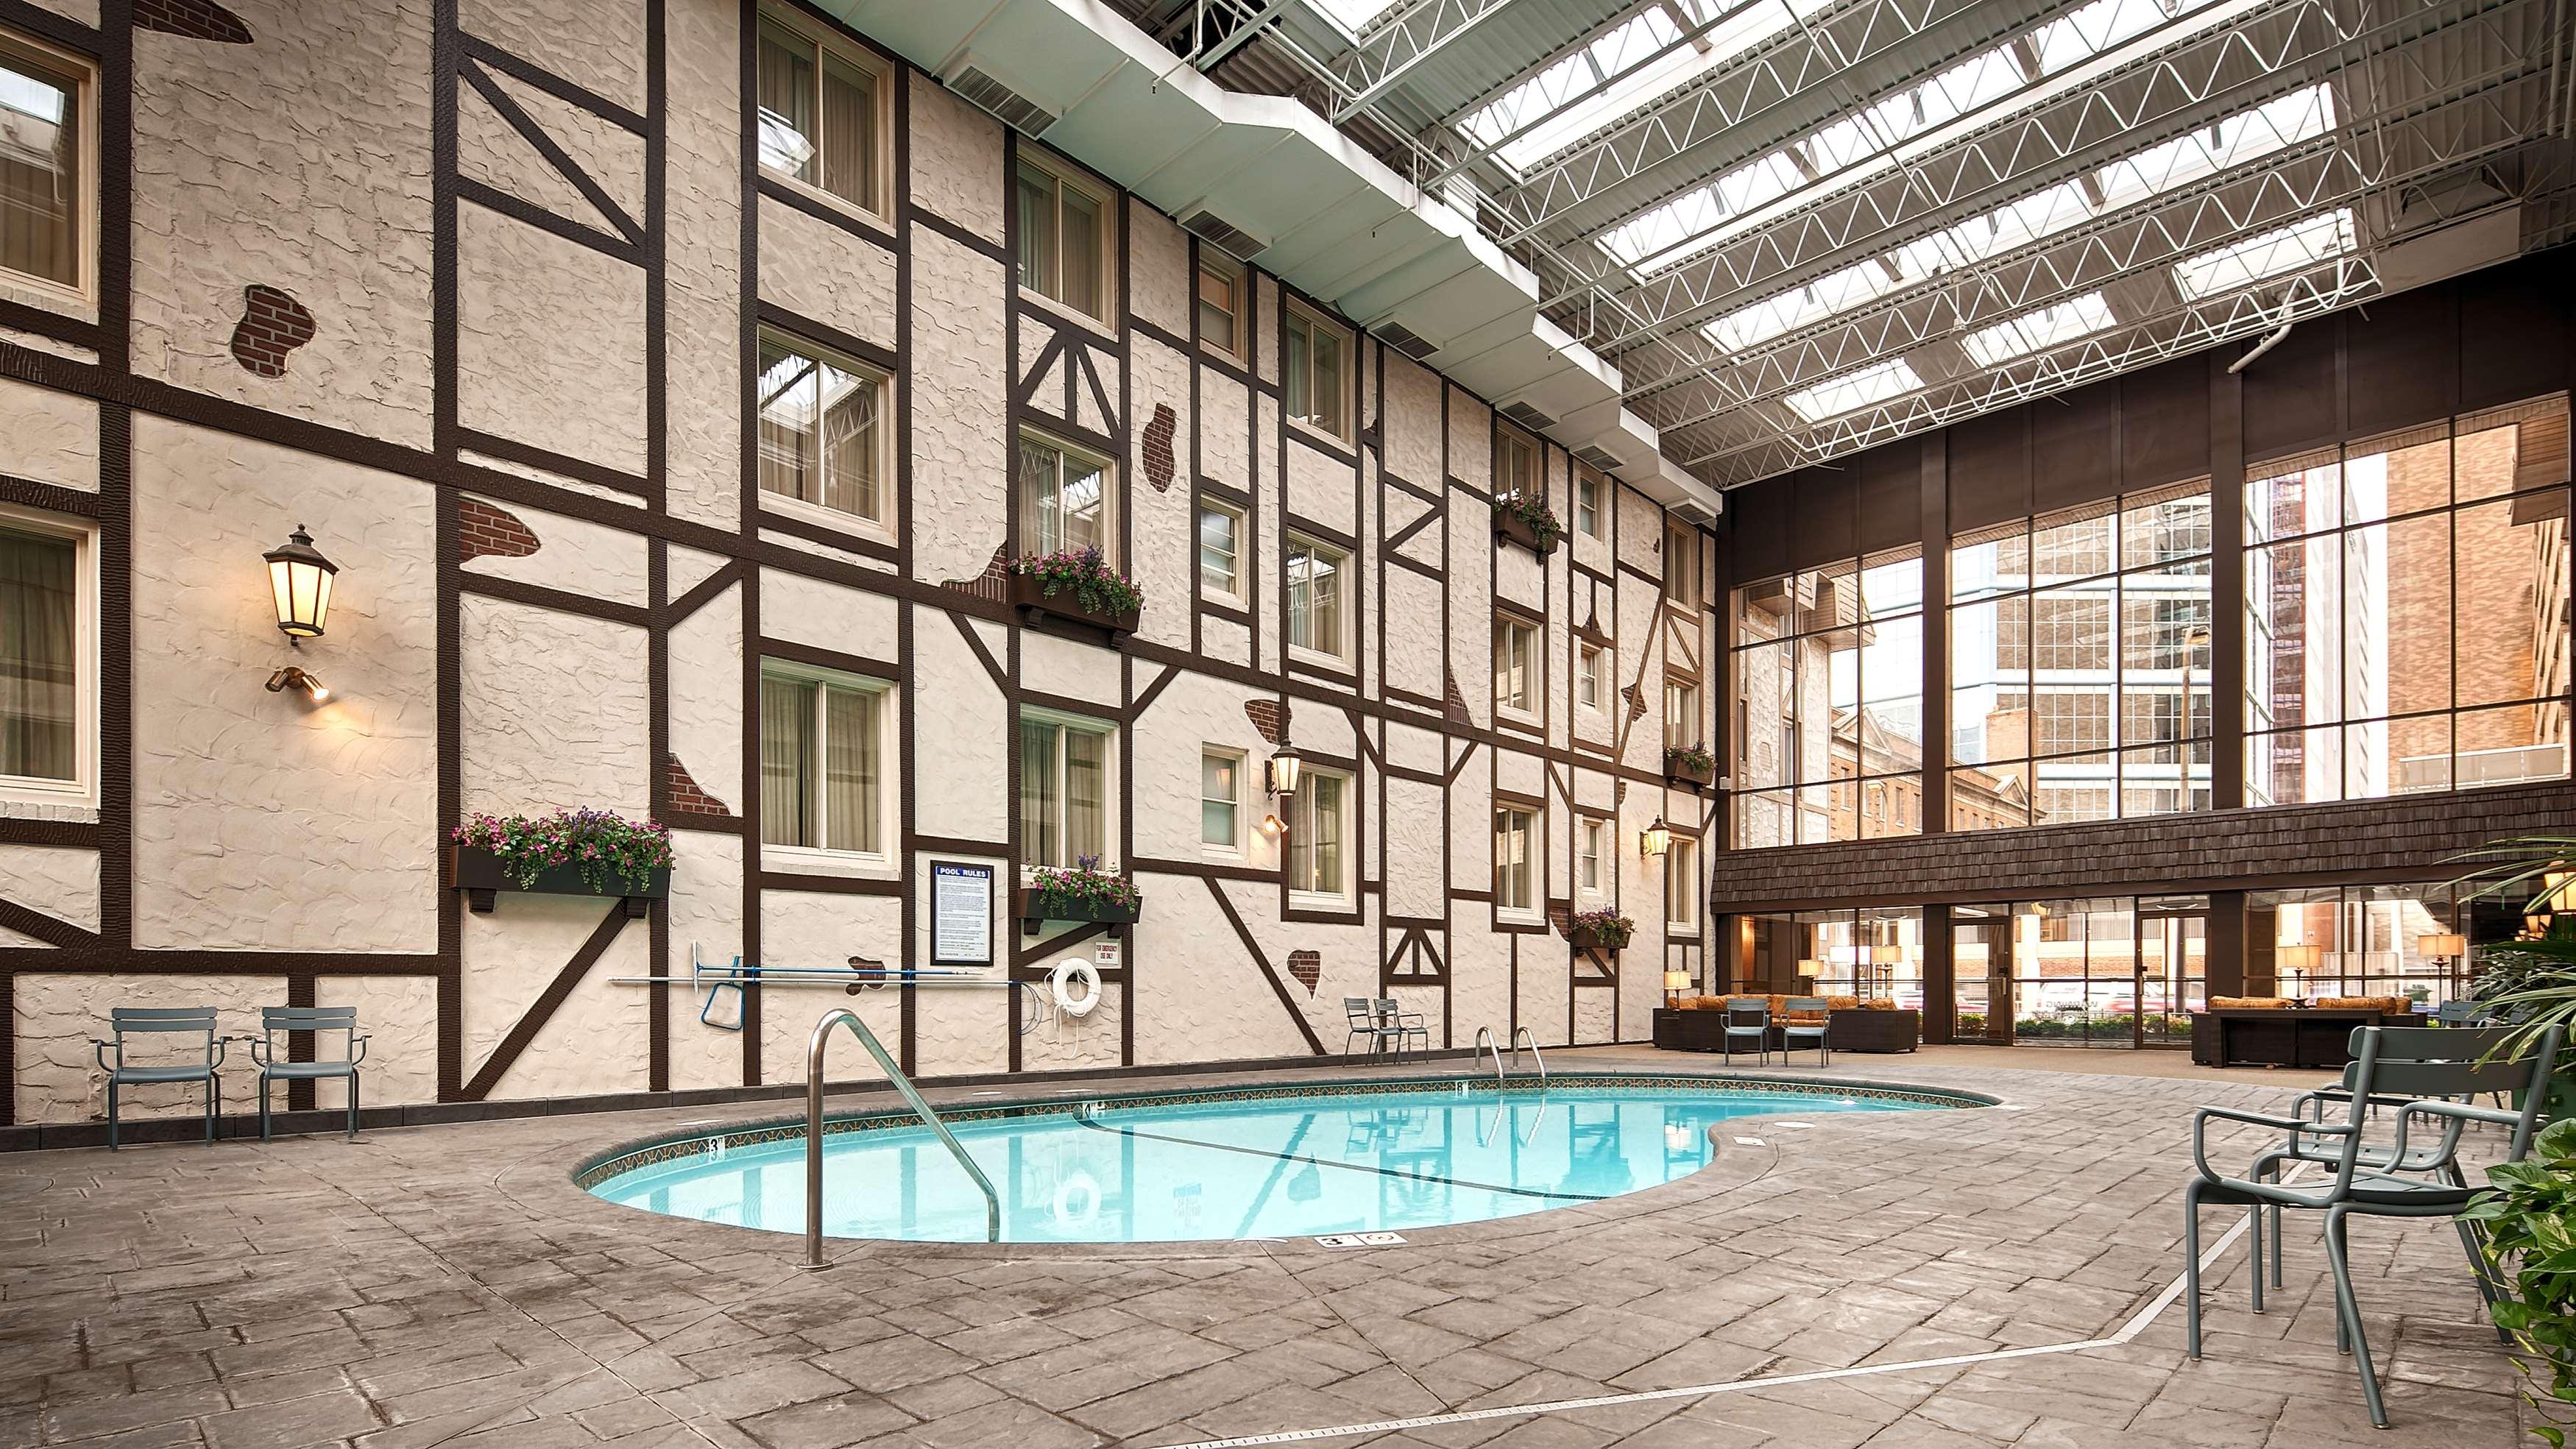 Best Western Plus The Normandy Inn & Suites image 14